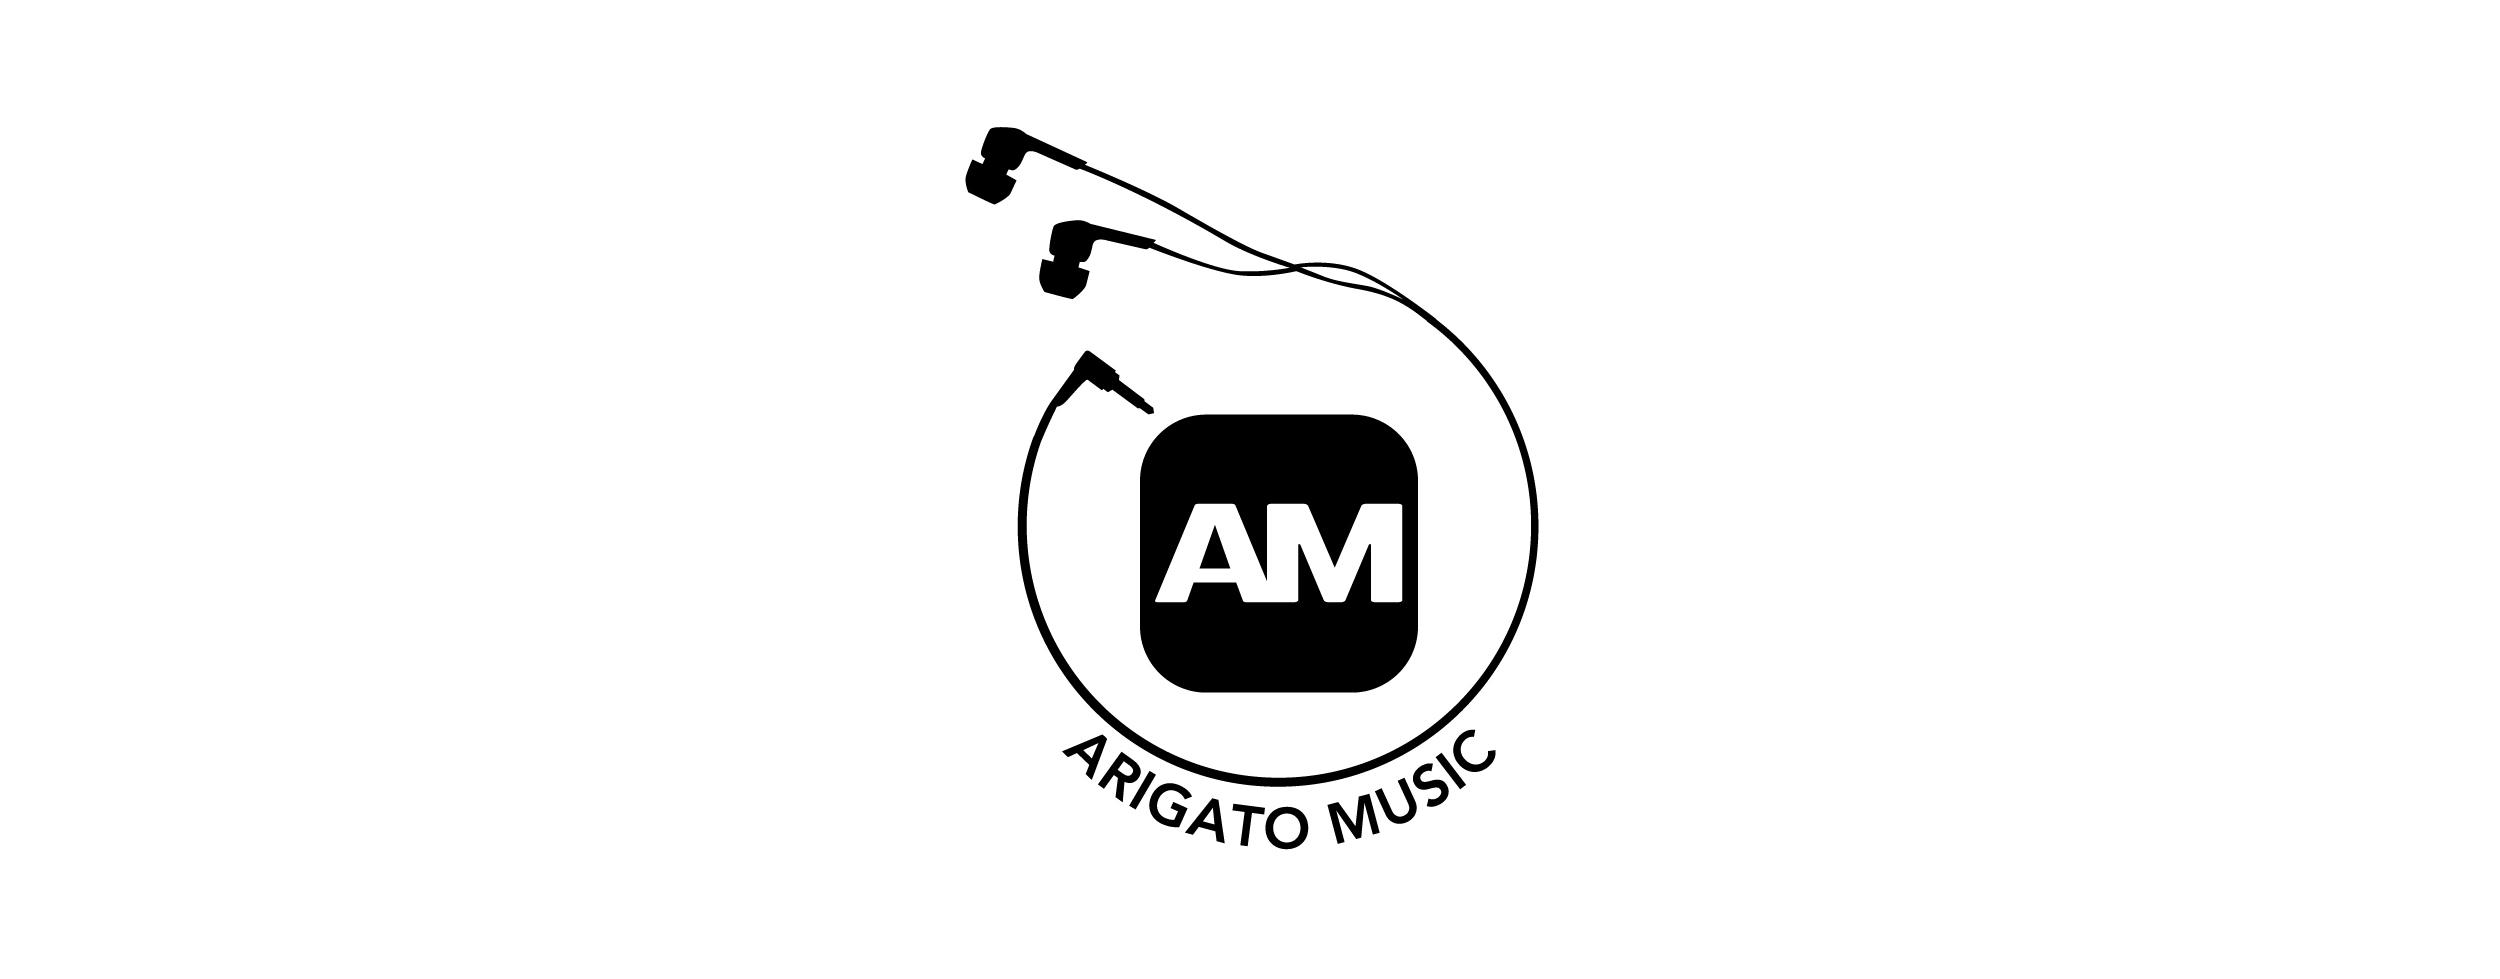 Amtop_newb